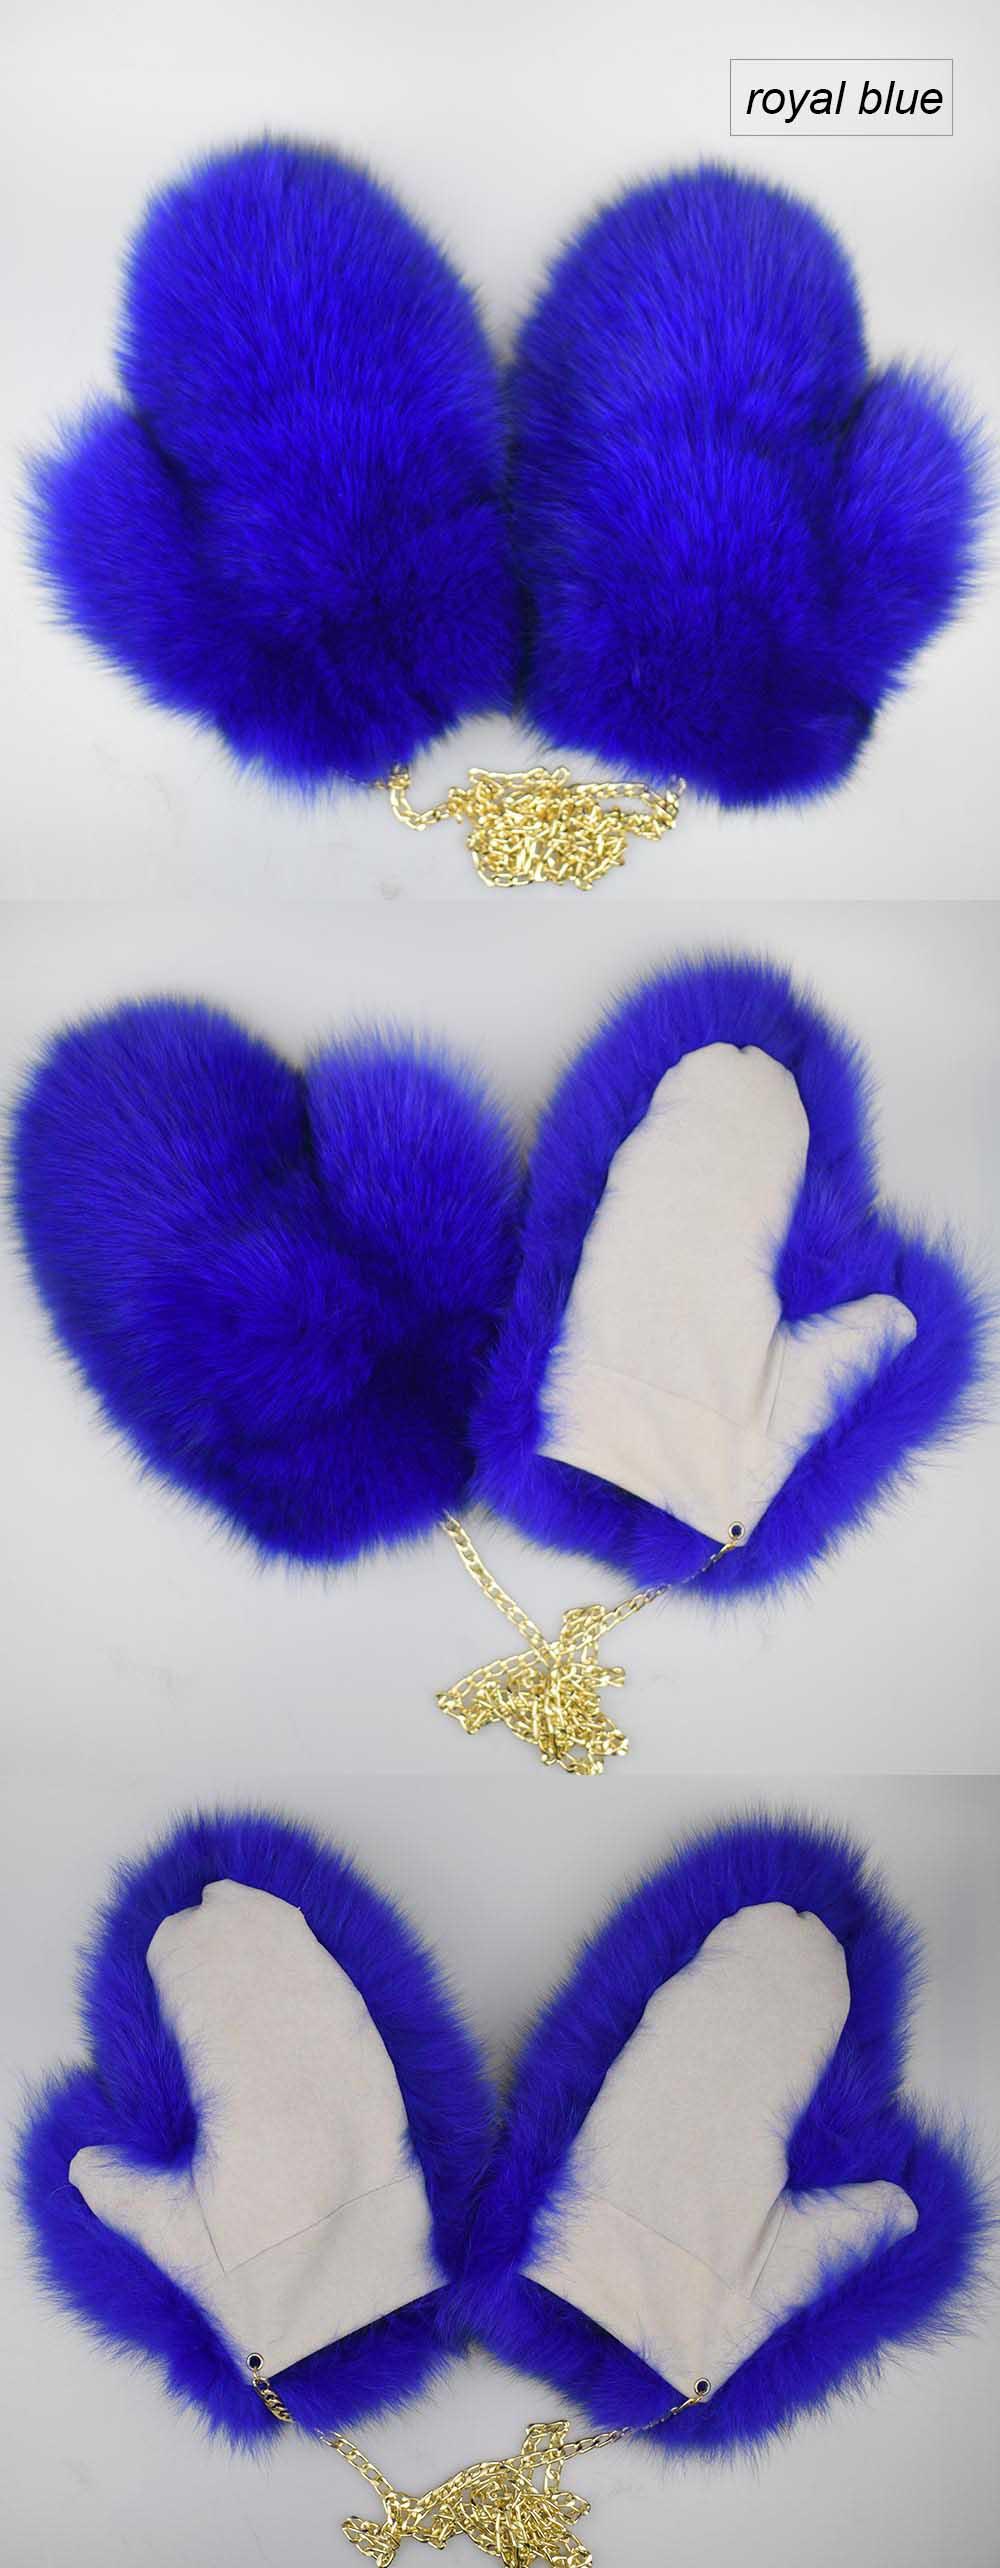 fox fur gloves color royal blue